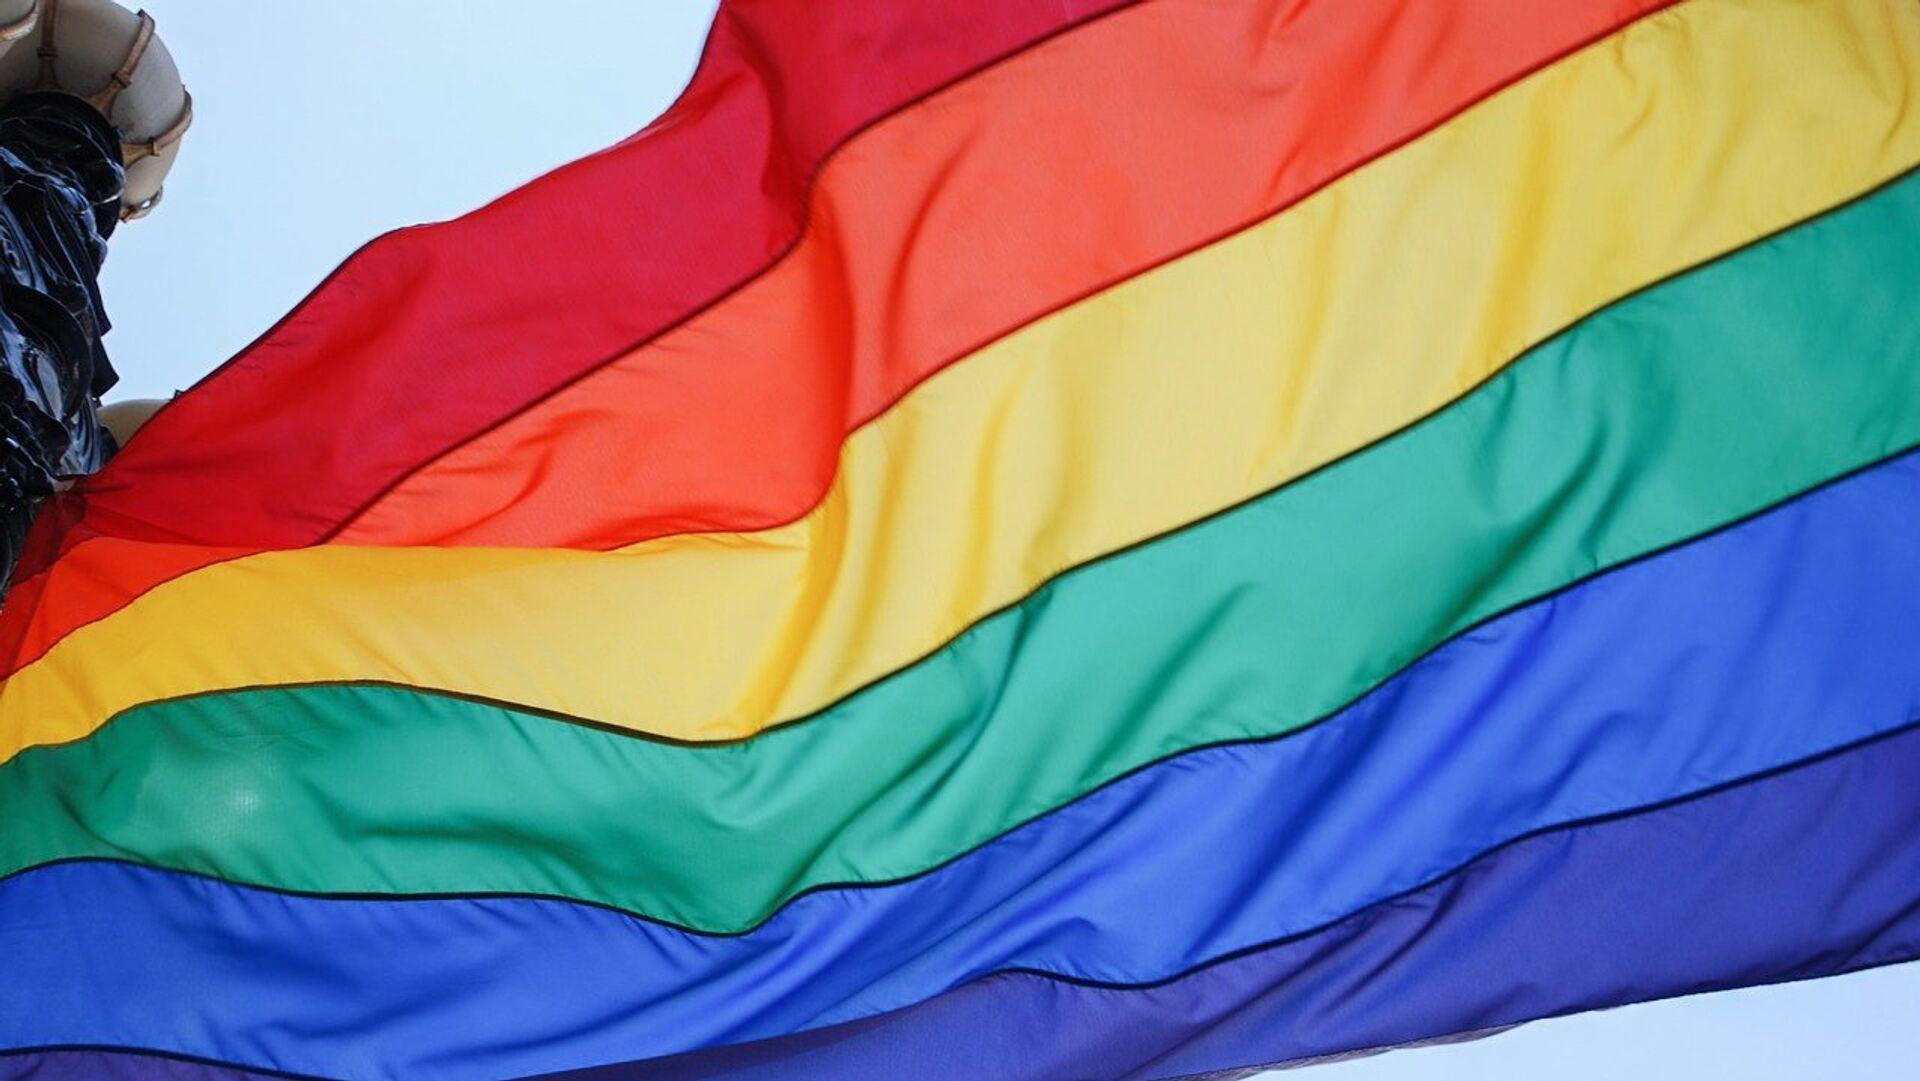 Bandera arcoíris, símbolo del movimiento LGBT - Sputnik Mundo, 1920, 05.02.2020